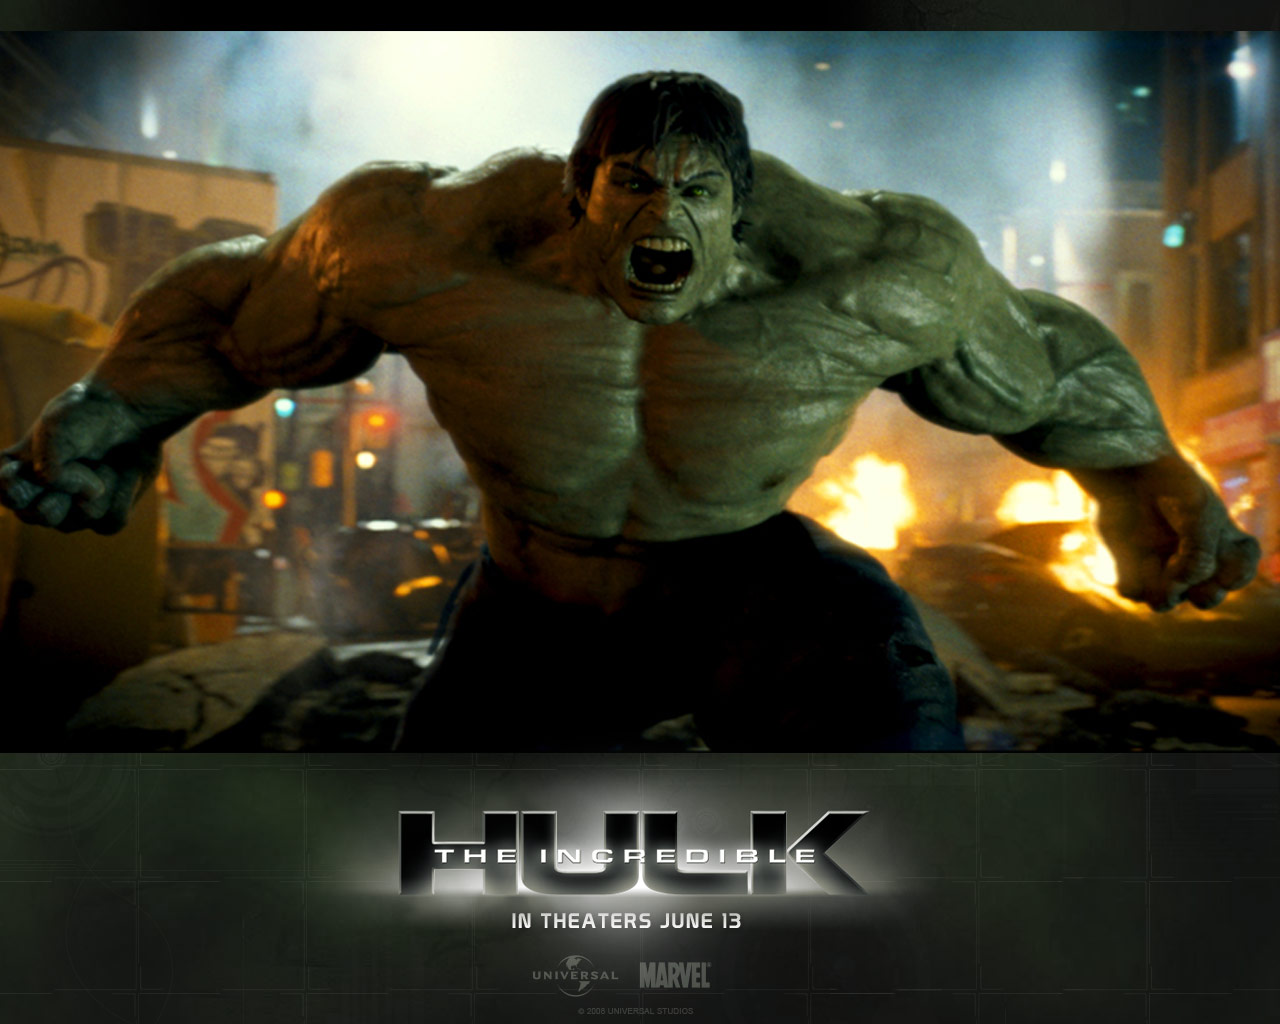 http://3.bp.blogspot.com/_F9D-oT93AnM/TOC7GJ5UHHI/AAAAAAAAABU/Nh_r-tlLF9c/s1600/Edward_Norton_in_The_Incredible_Hulk_Wallpaper_7_1280.jpg